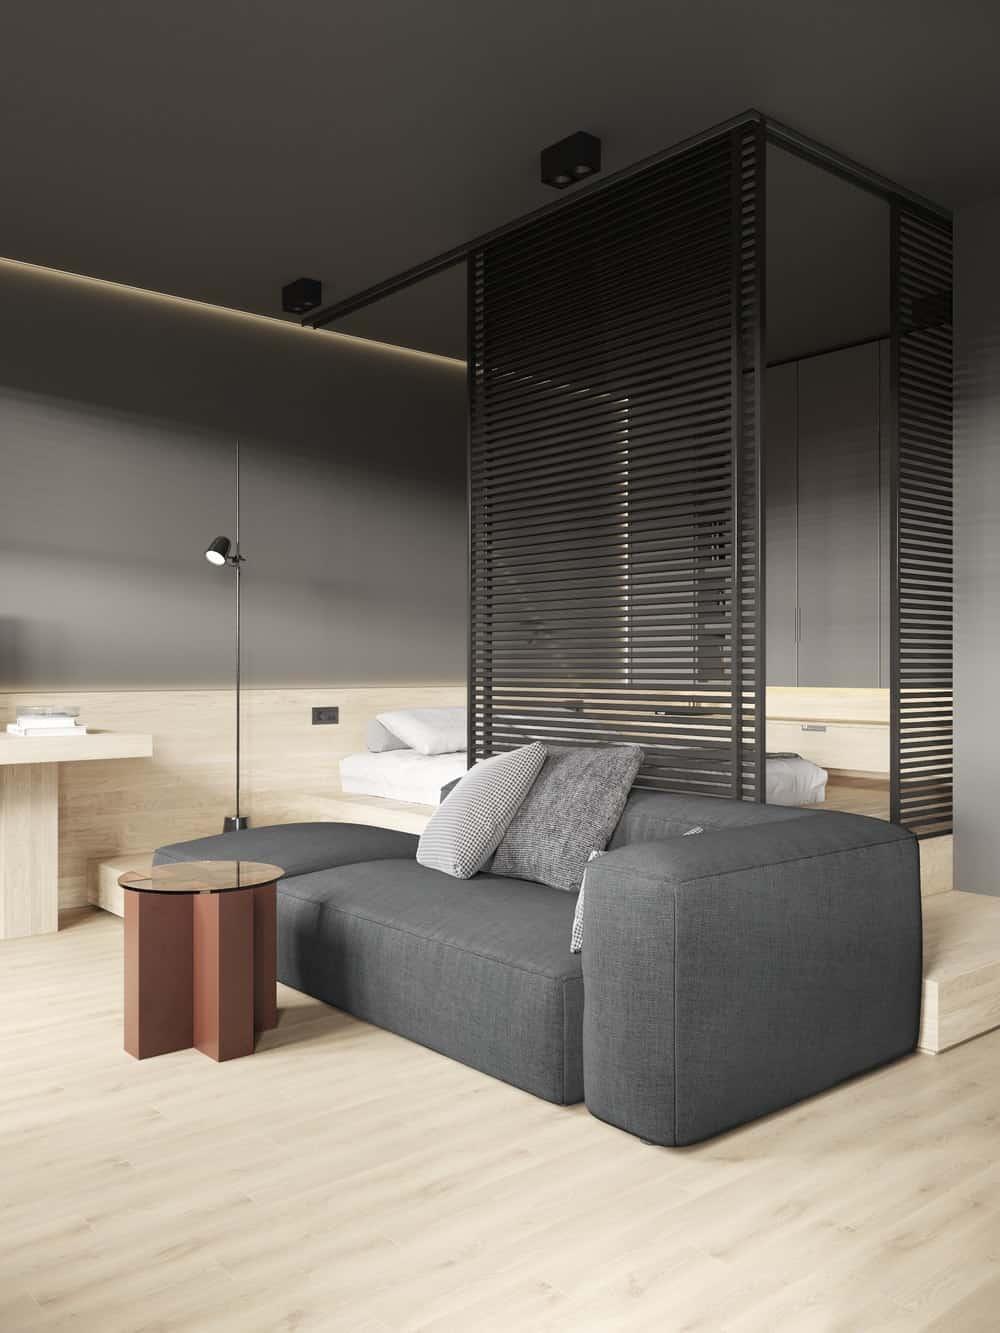 Living room in the Goose designed by Cartelle Design.